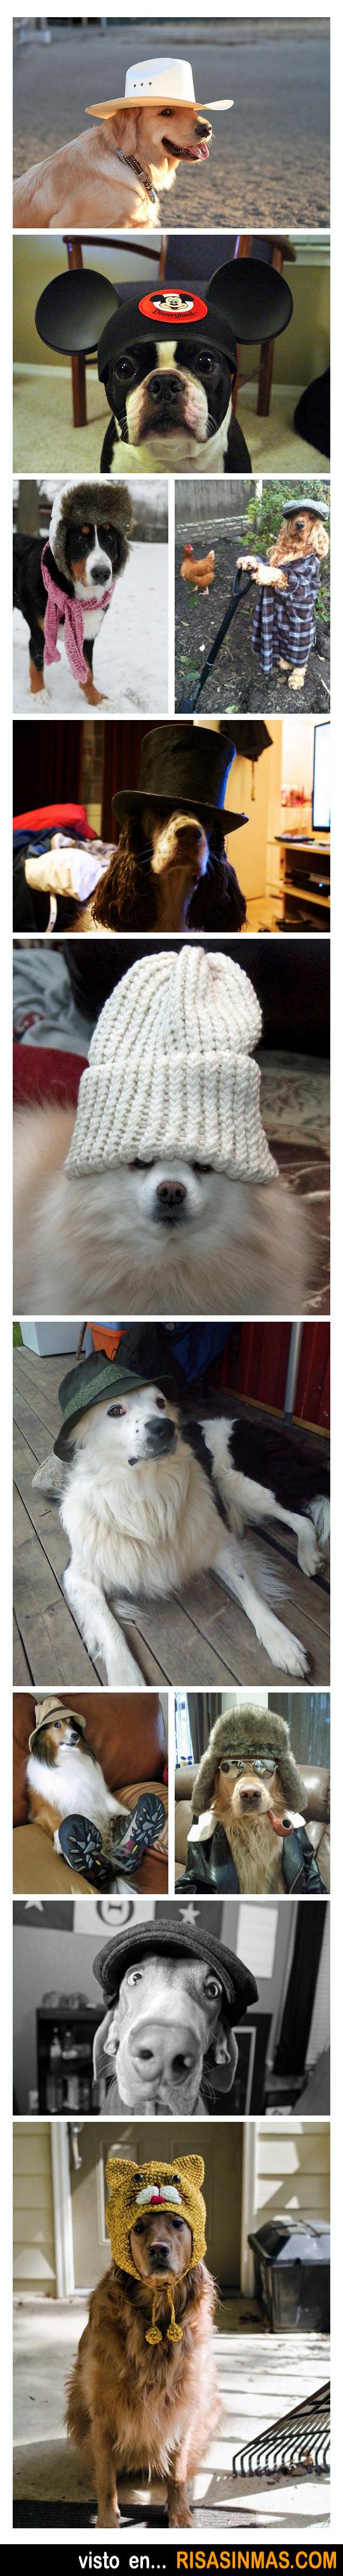 Perros con gorro